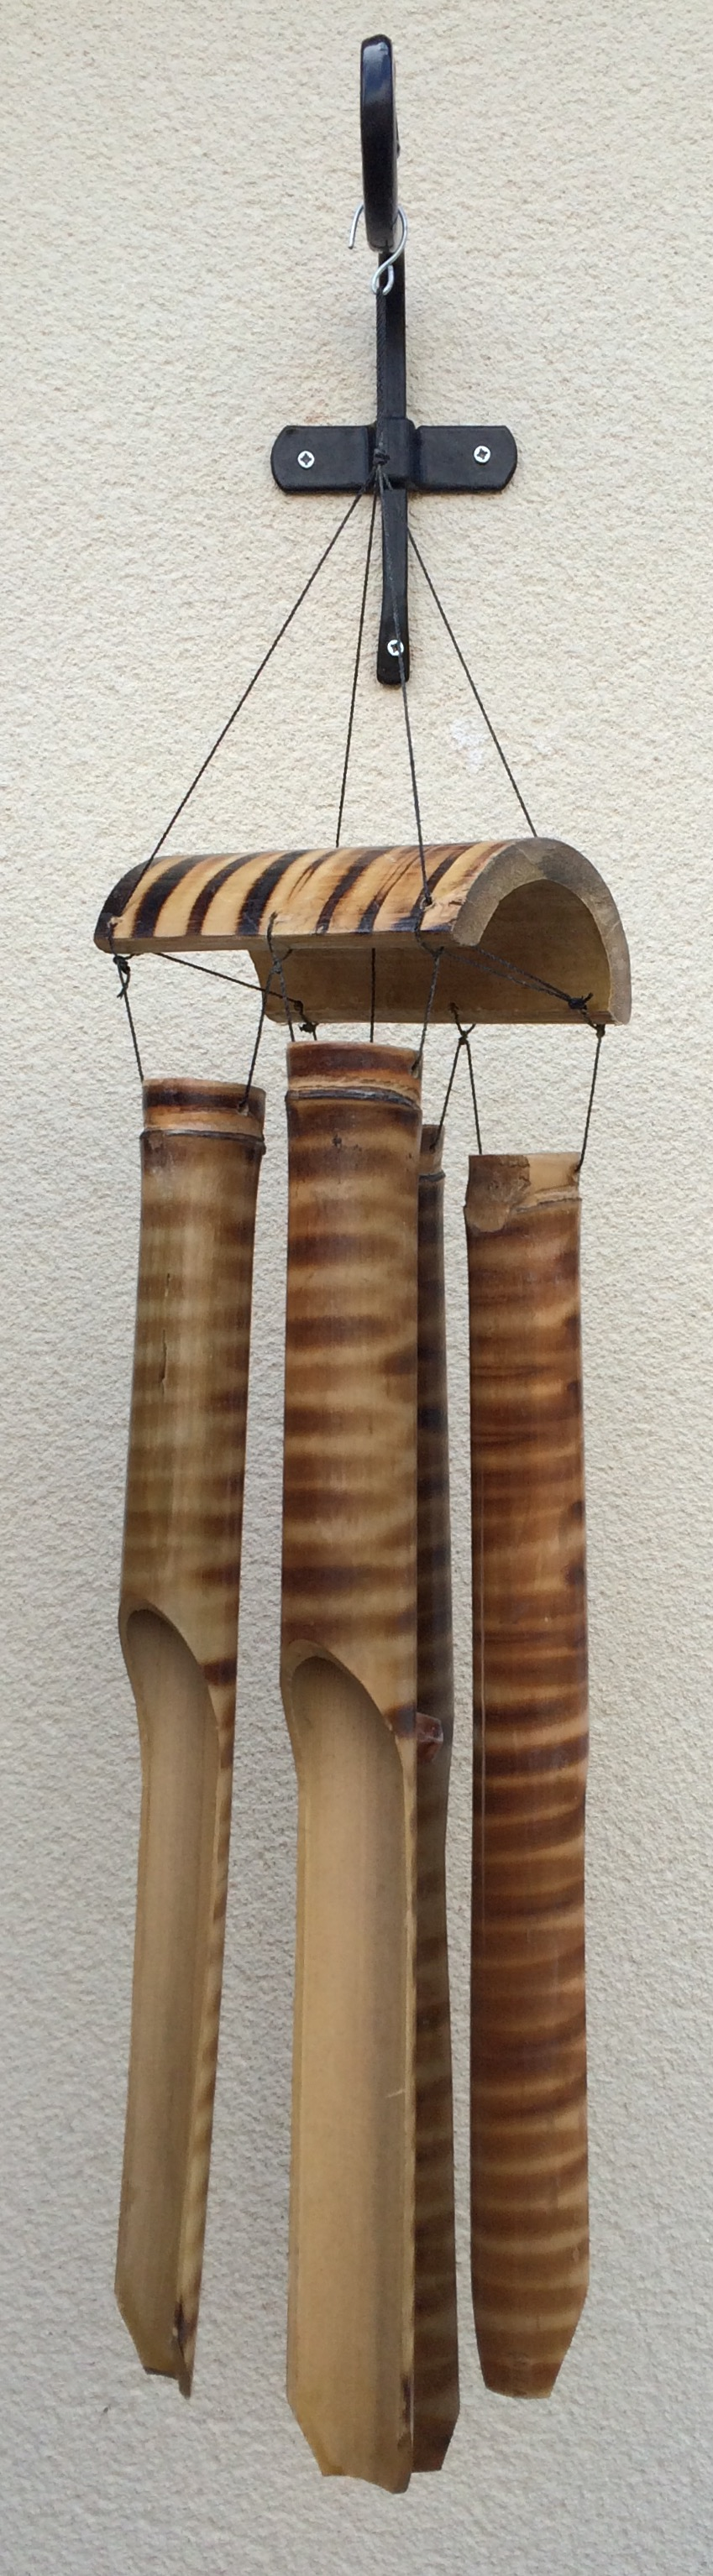 Bamboo wind chimes in children's sensory garden